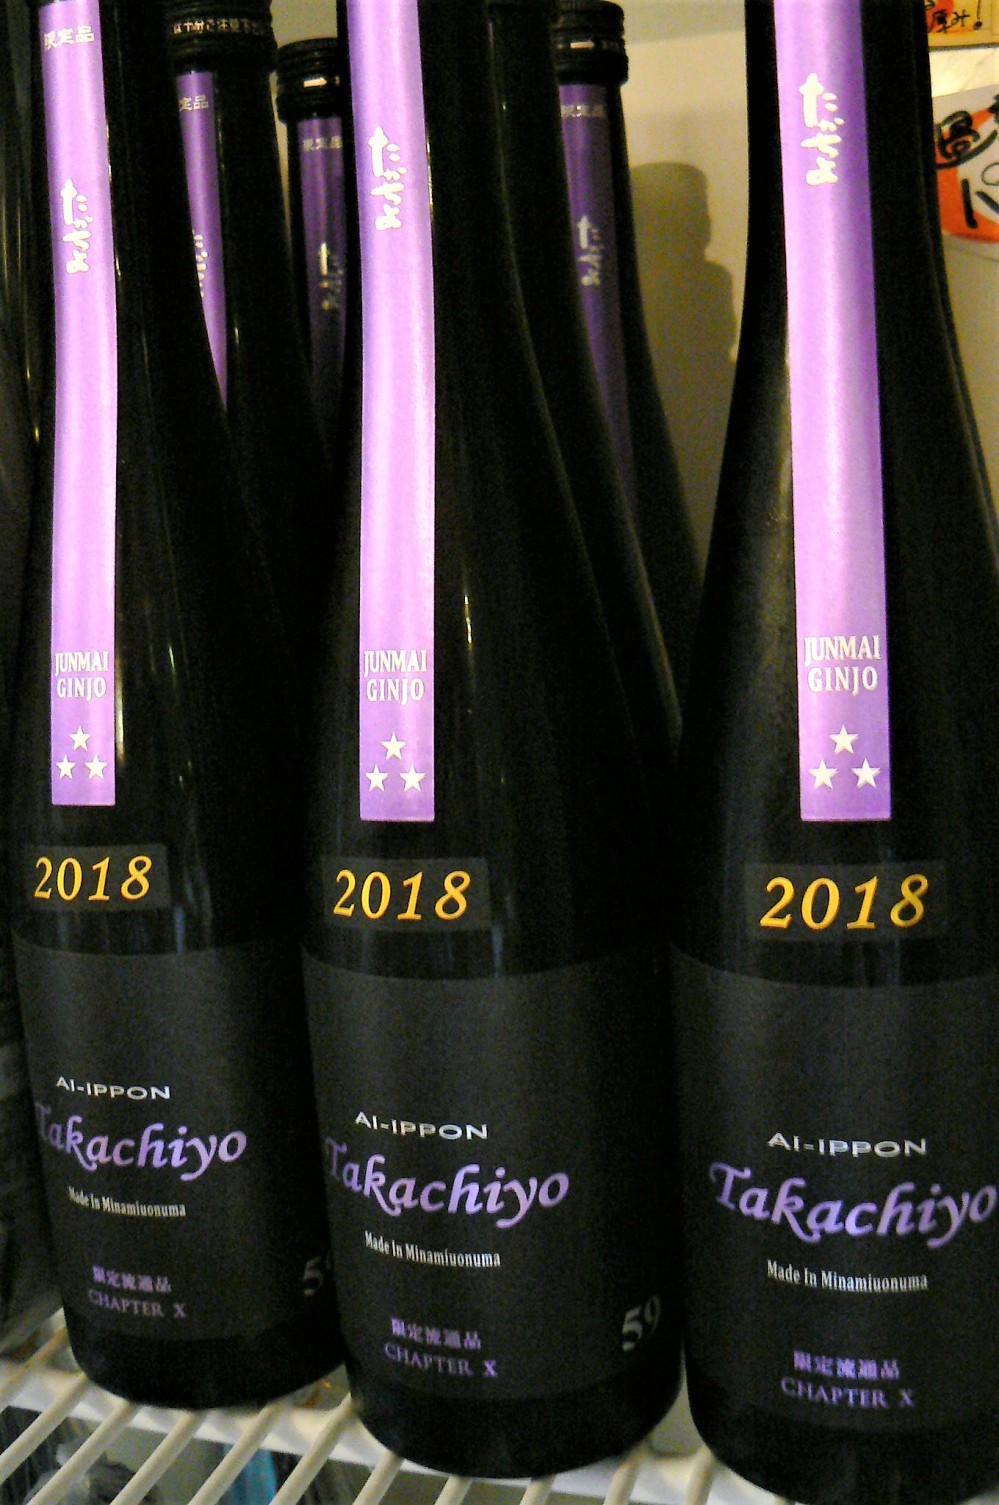 2018.8.Takachiyoパープル